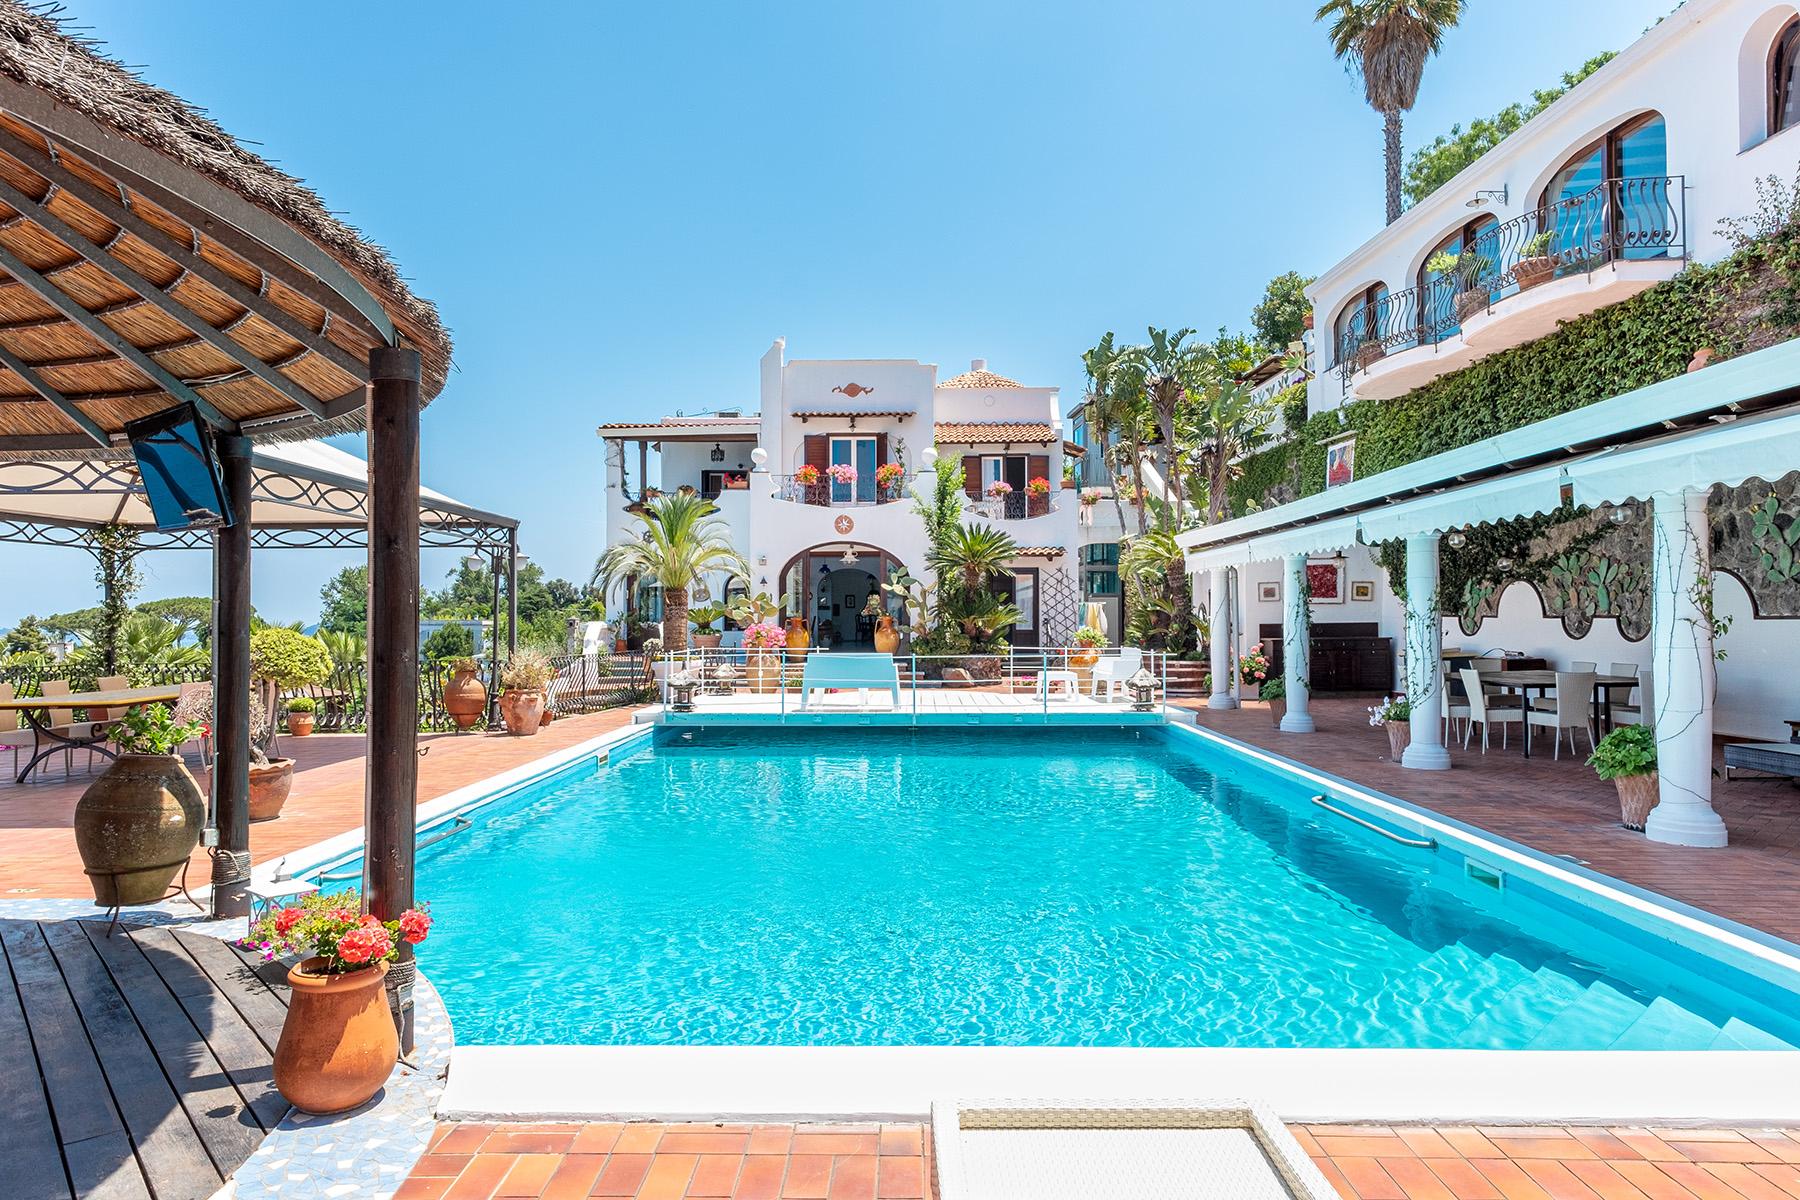 Villa in Vendita a Ischia: 5 locali, 500 mq - Foto 1